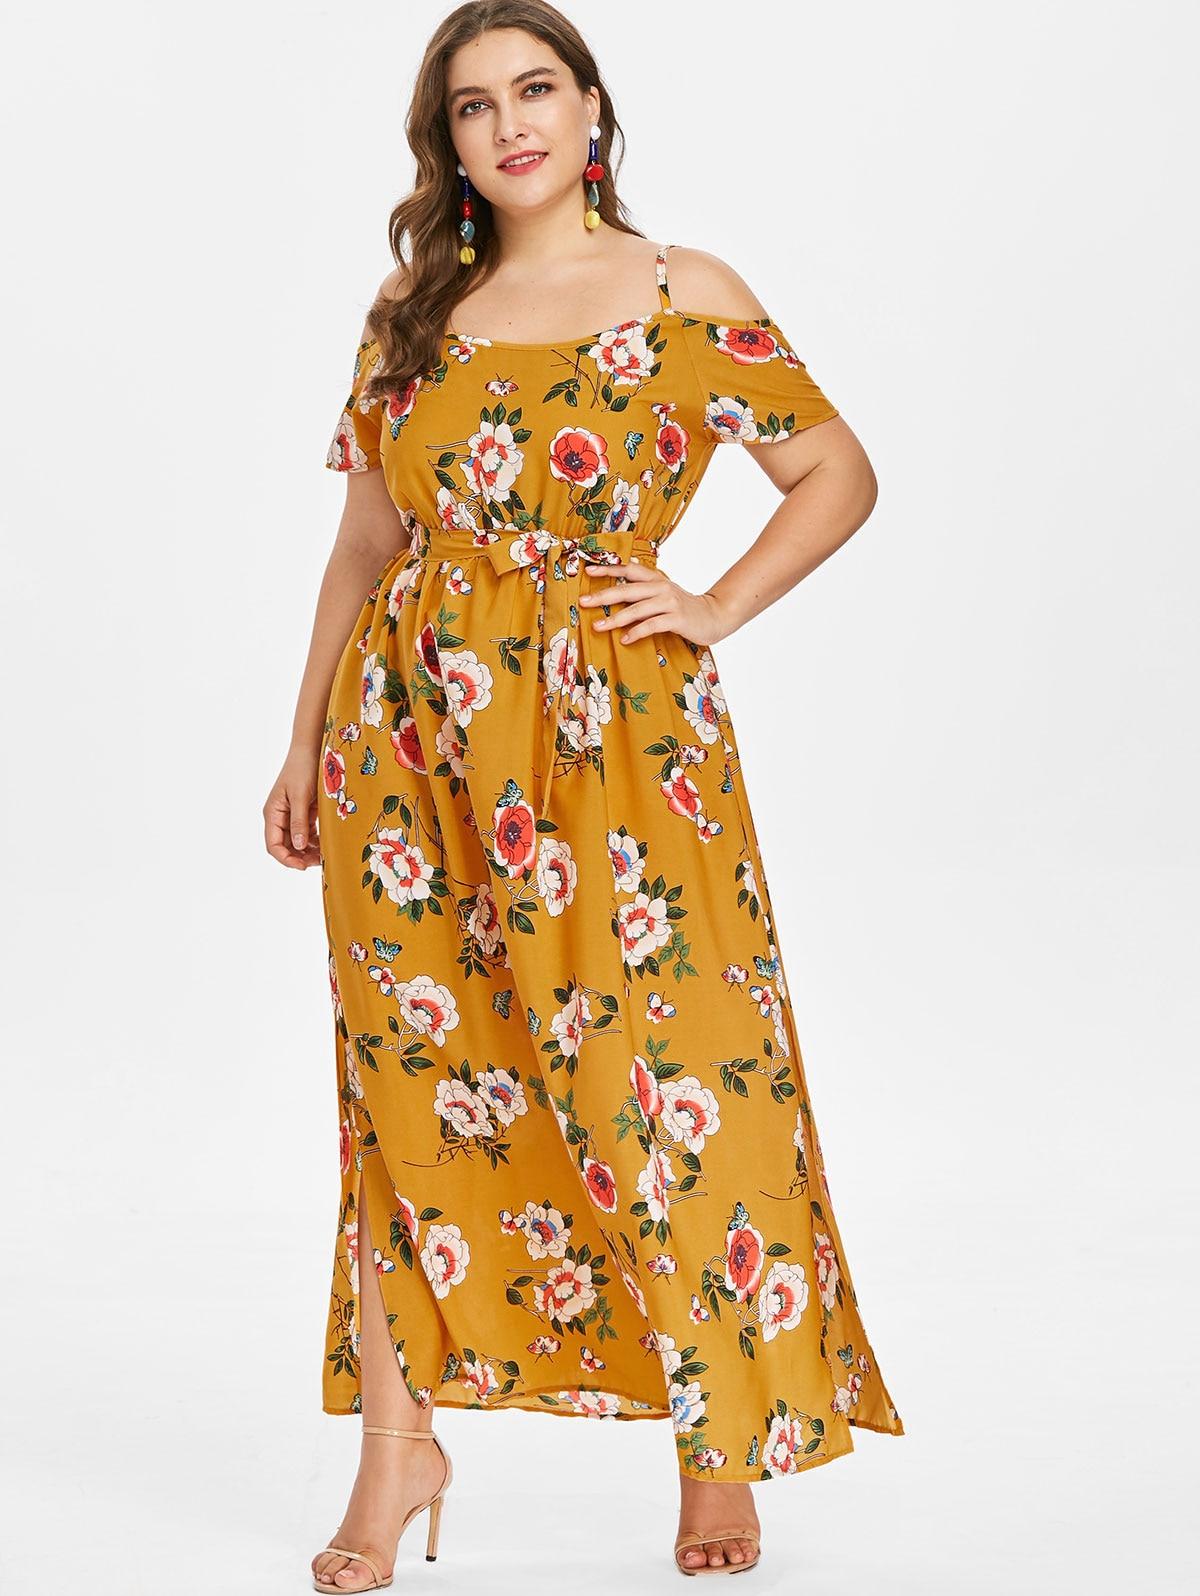 d6e095854cbb3 Wipalo Plus Size Boho Cami Empire Waist Dress Floral Print Slit Belt Cold  Shoulder Spaghetti Strap Casual Beach Dress Vestidos